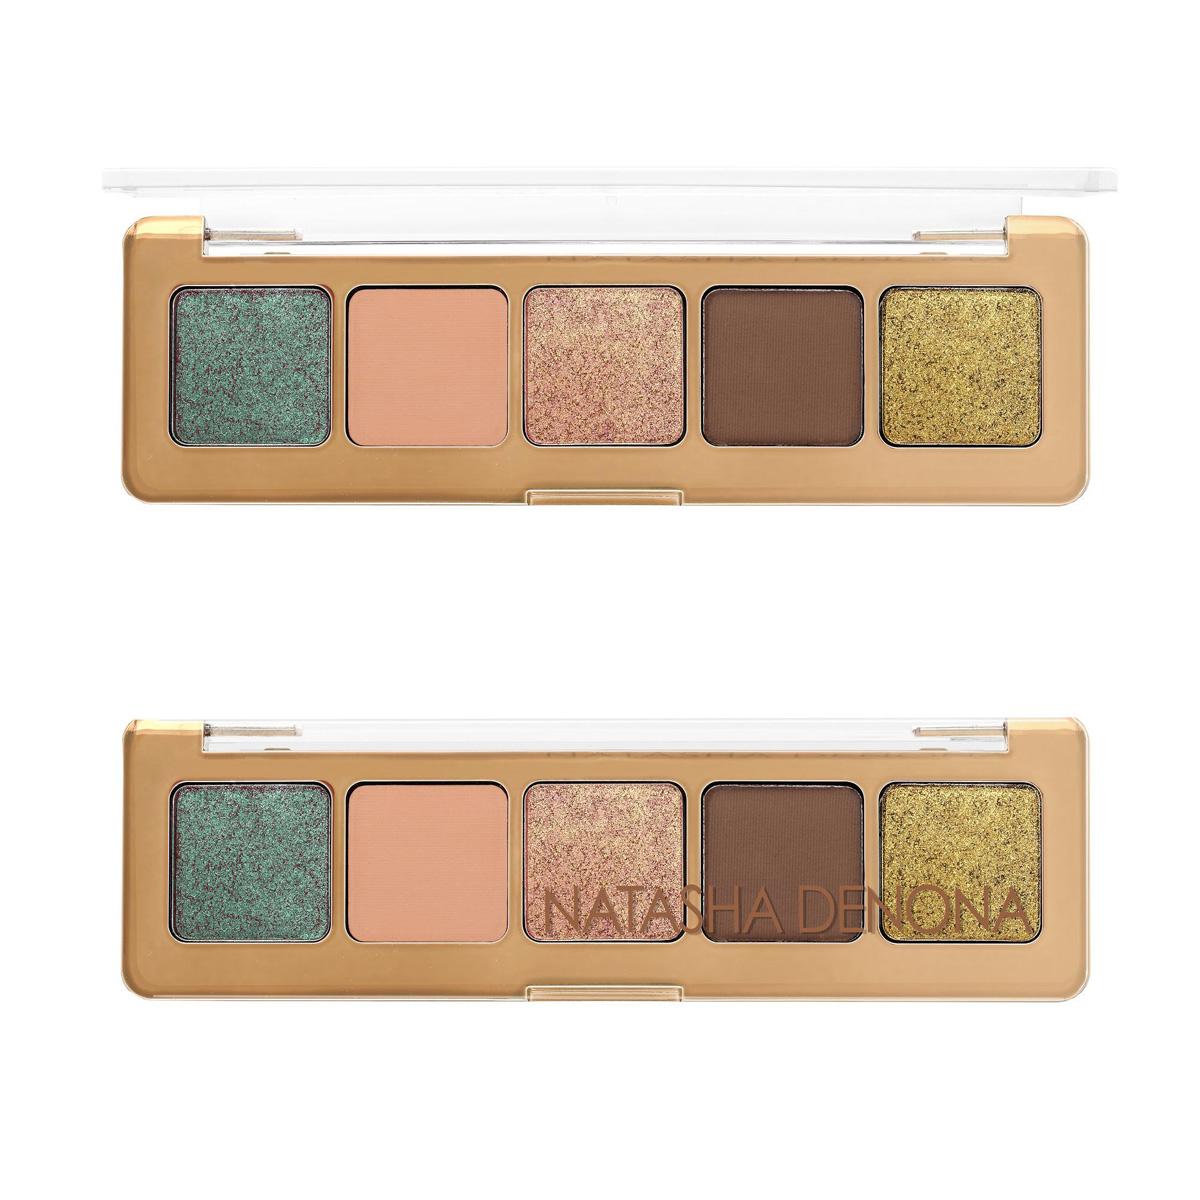 natasha-denona-mini-star-eyeshadow-palette